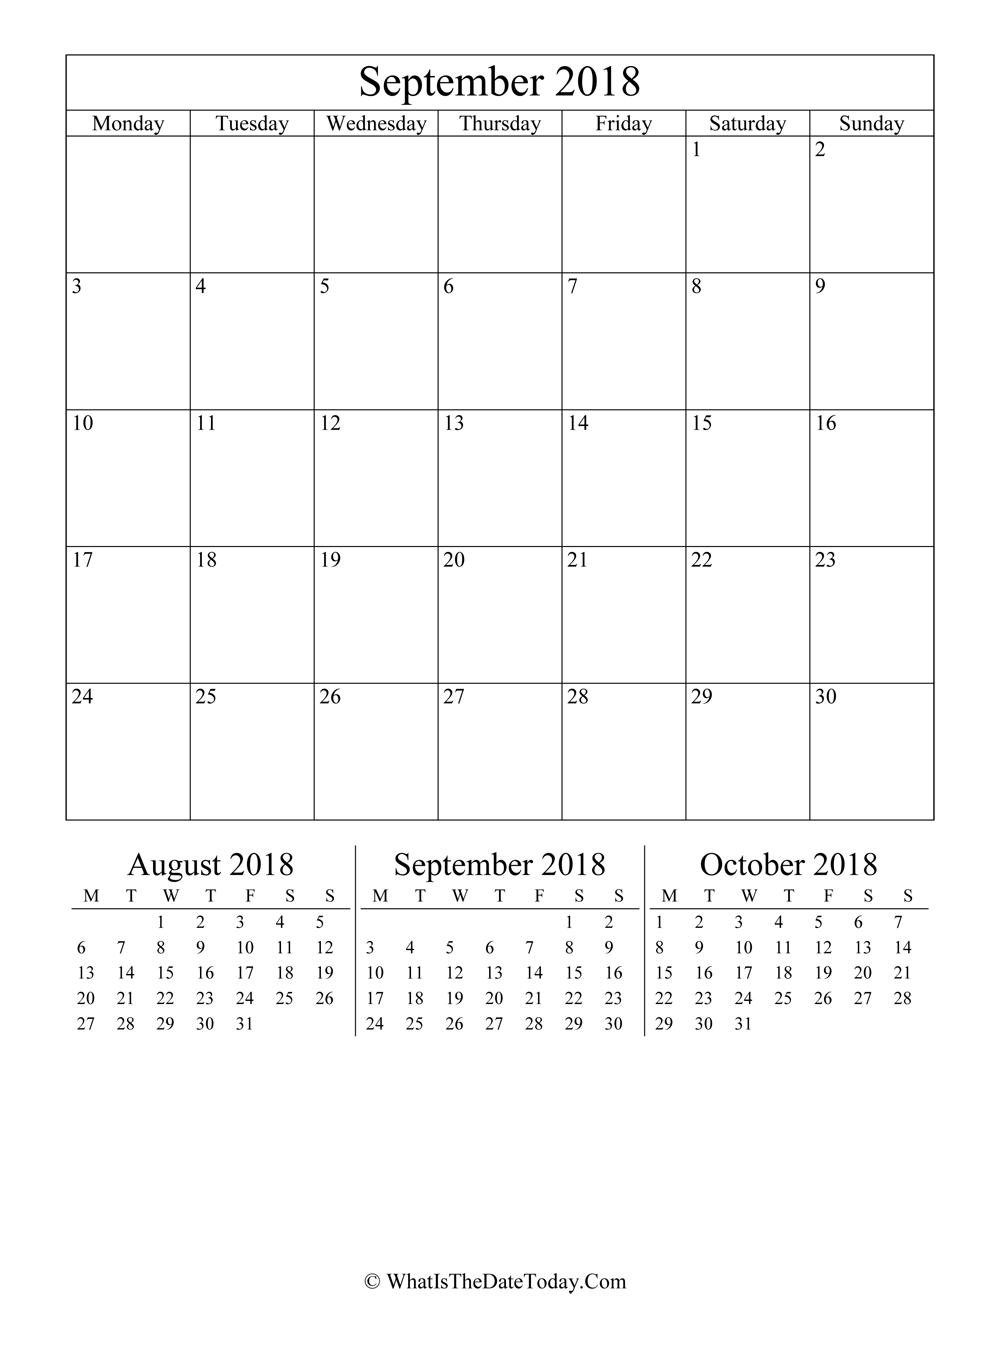 September 2018 Editable Calendar (vertical layout